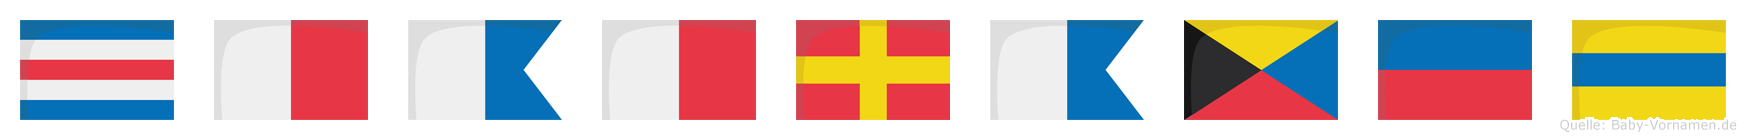 Chahrazed im Flaggenalphabet